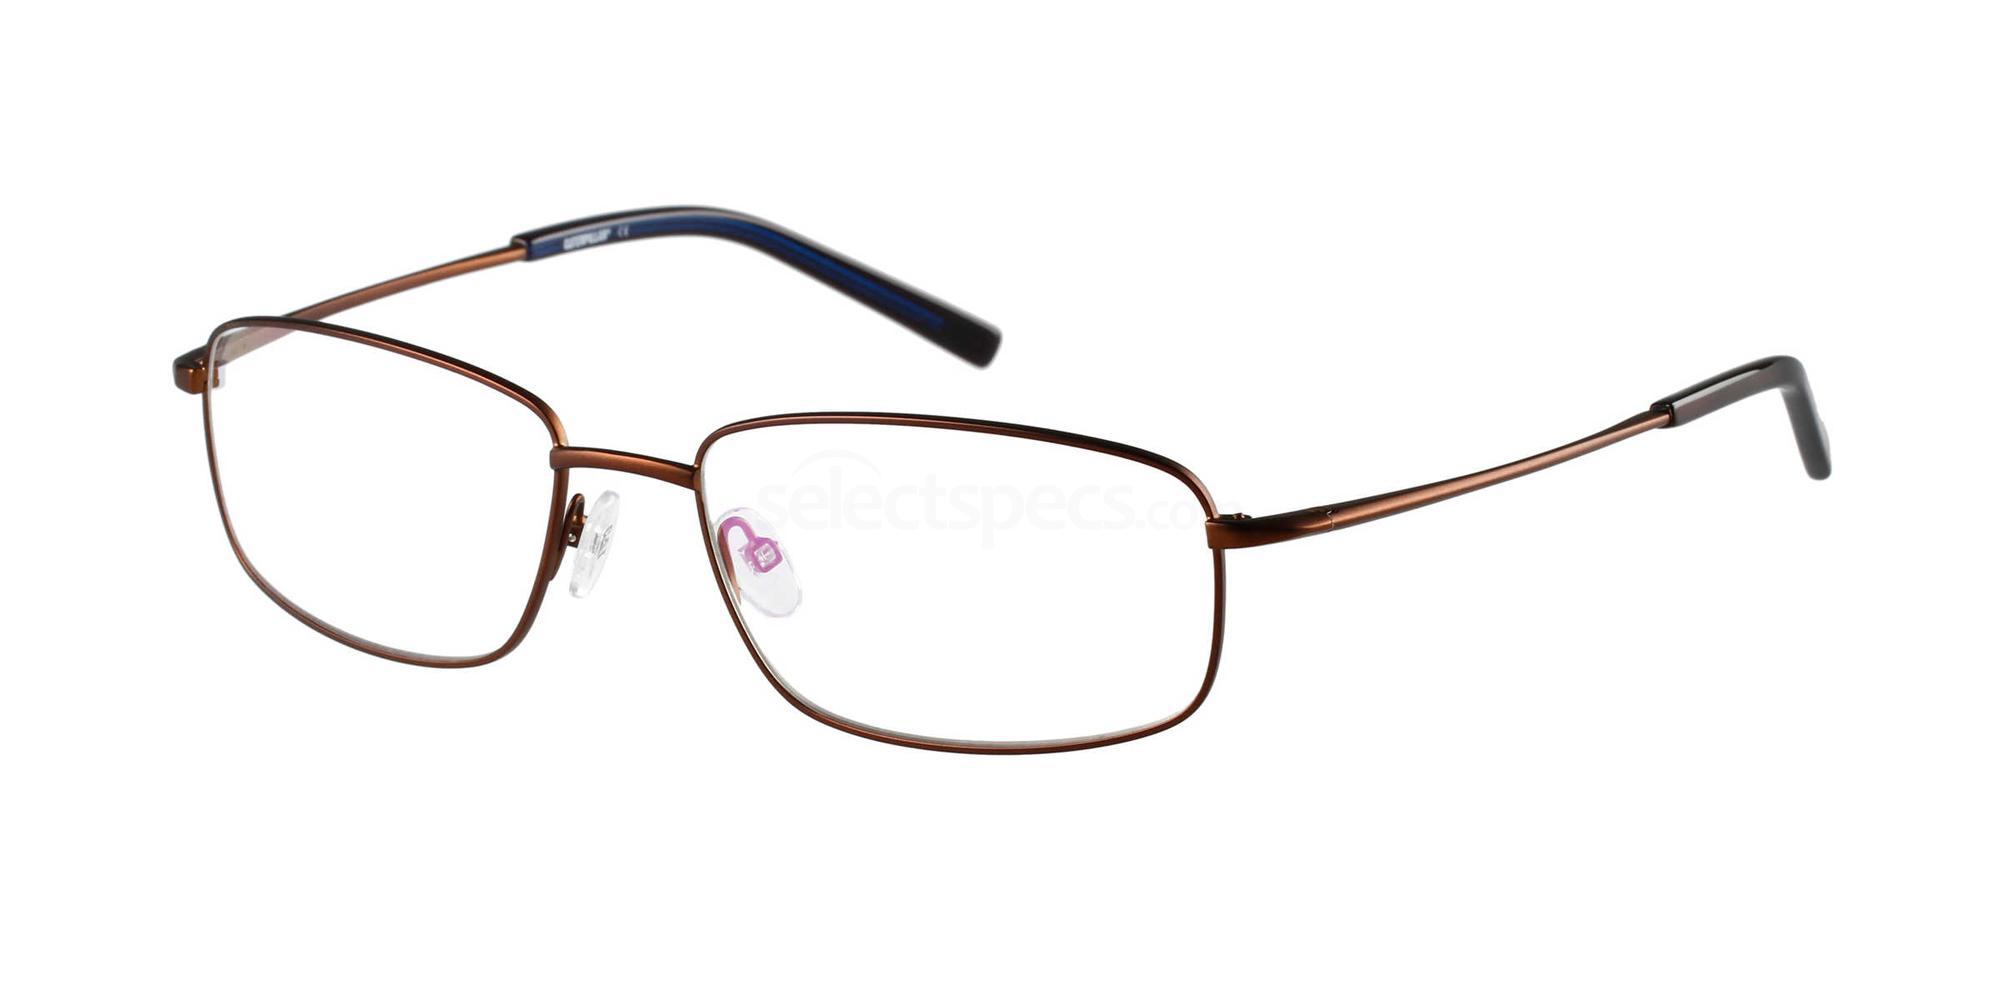 003 CTO-G09 Glasses, CAT